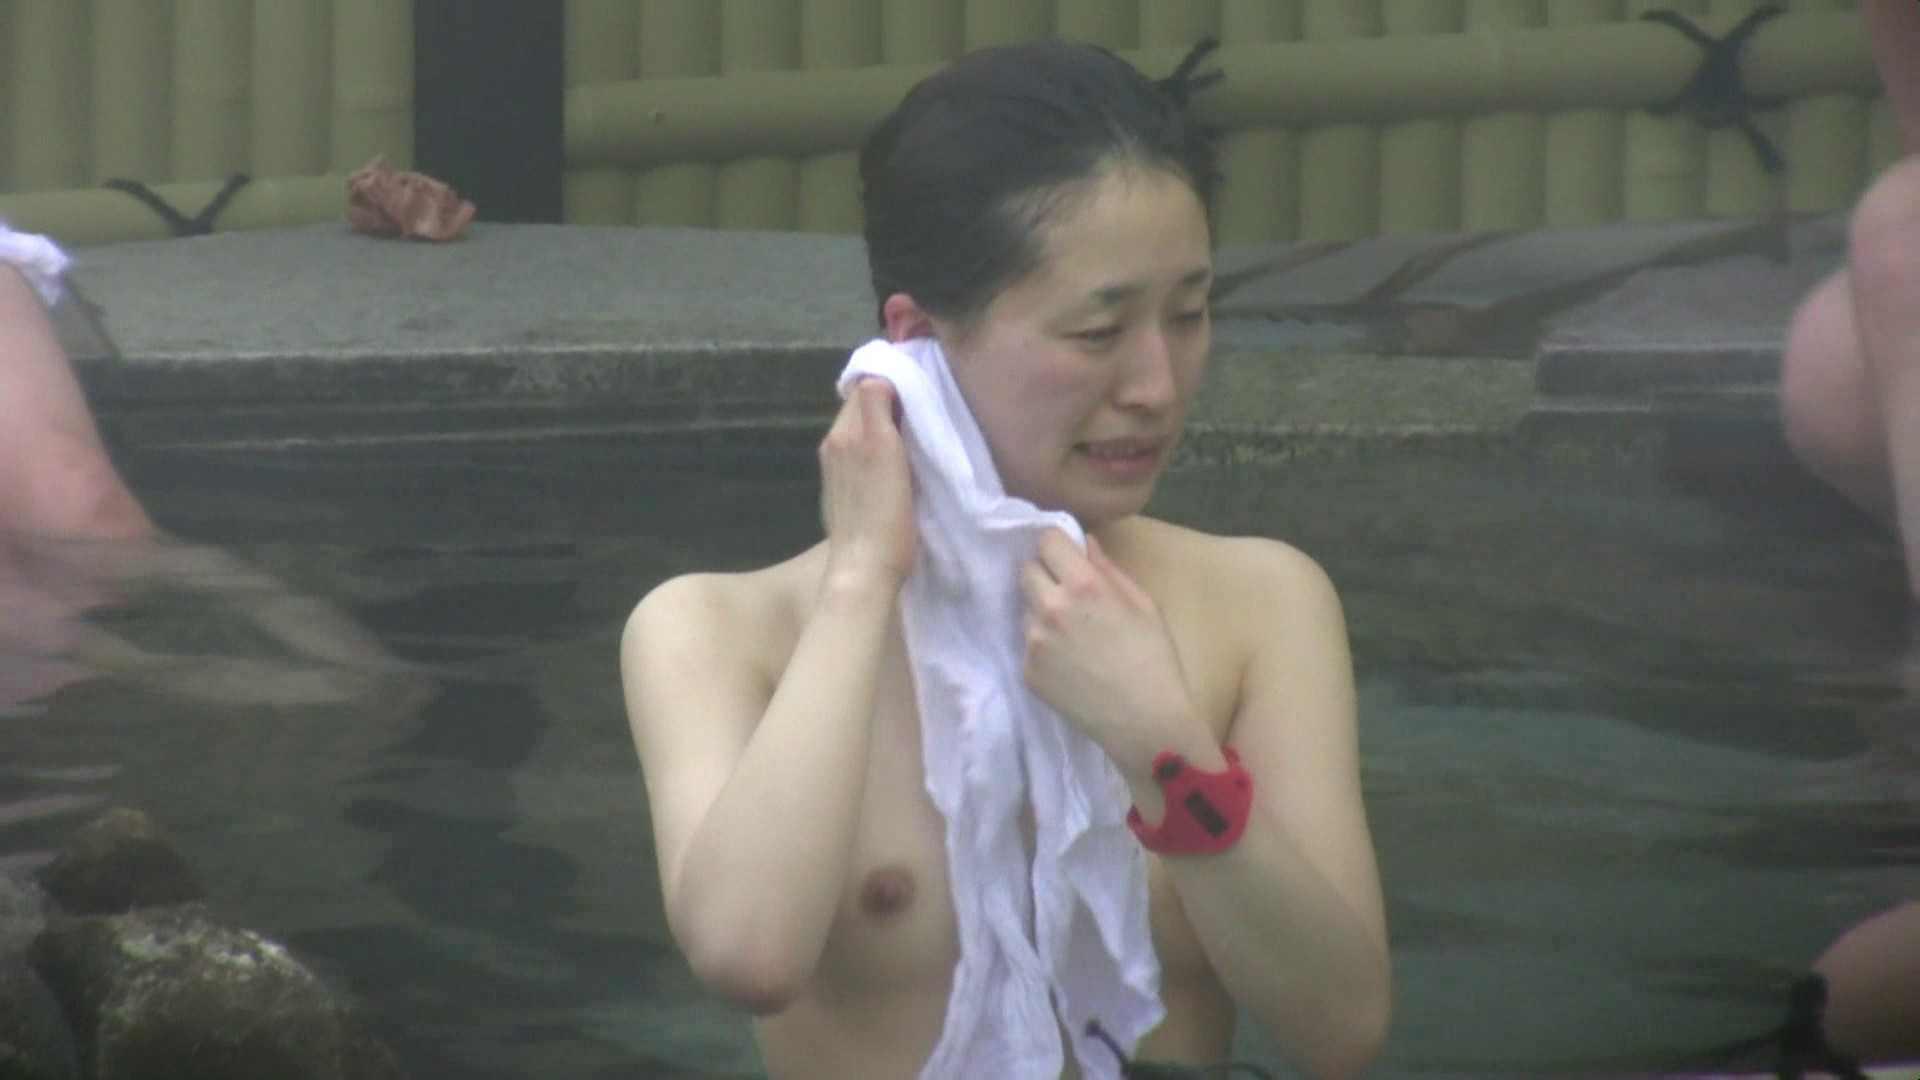 Aquaな露天風呂Vol.583 盗撮 戯れ無修正画像 106枚 38